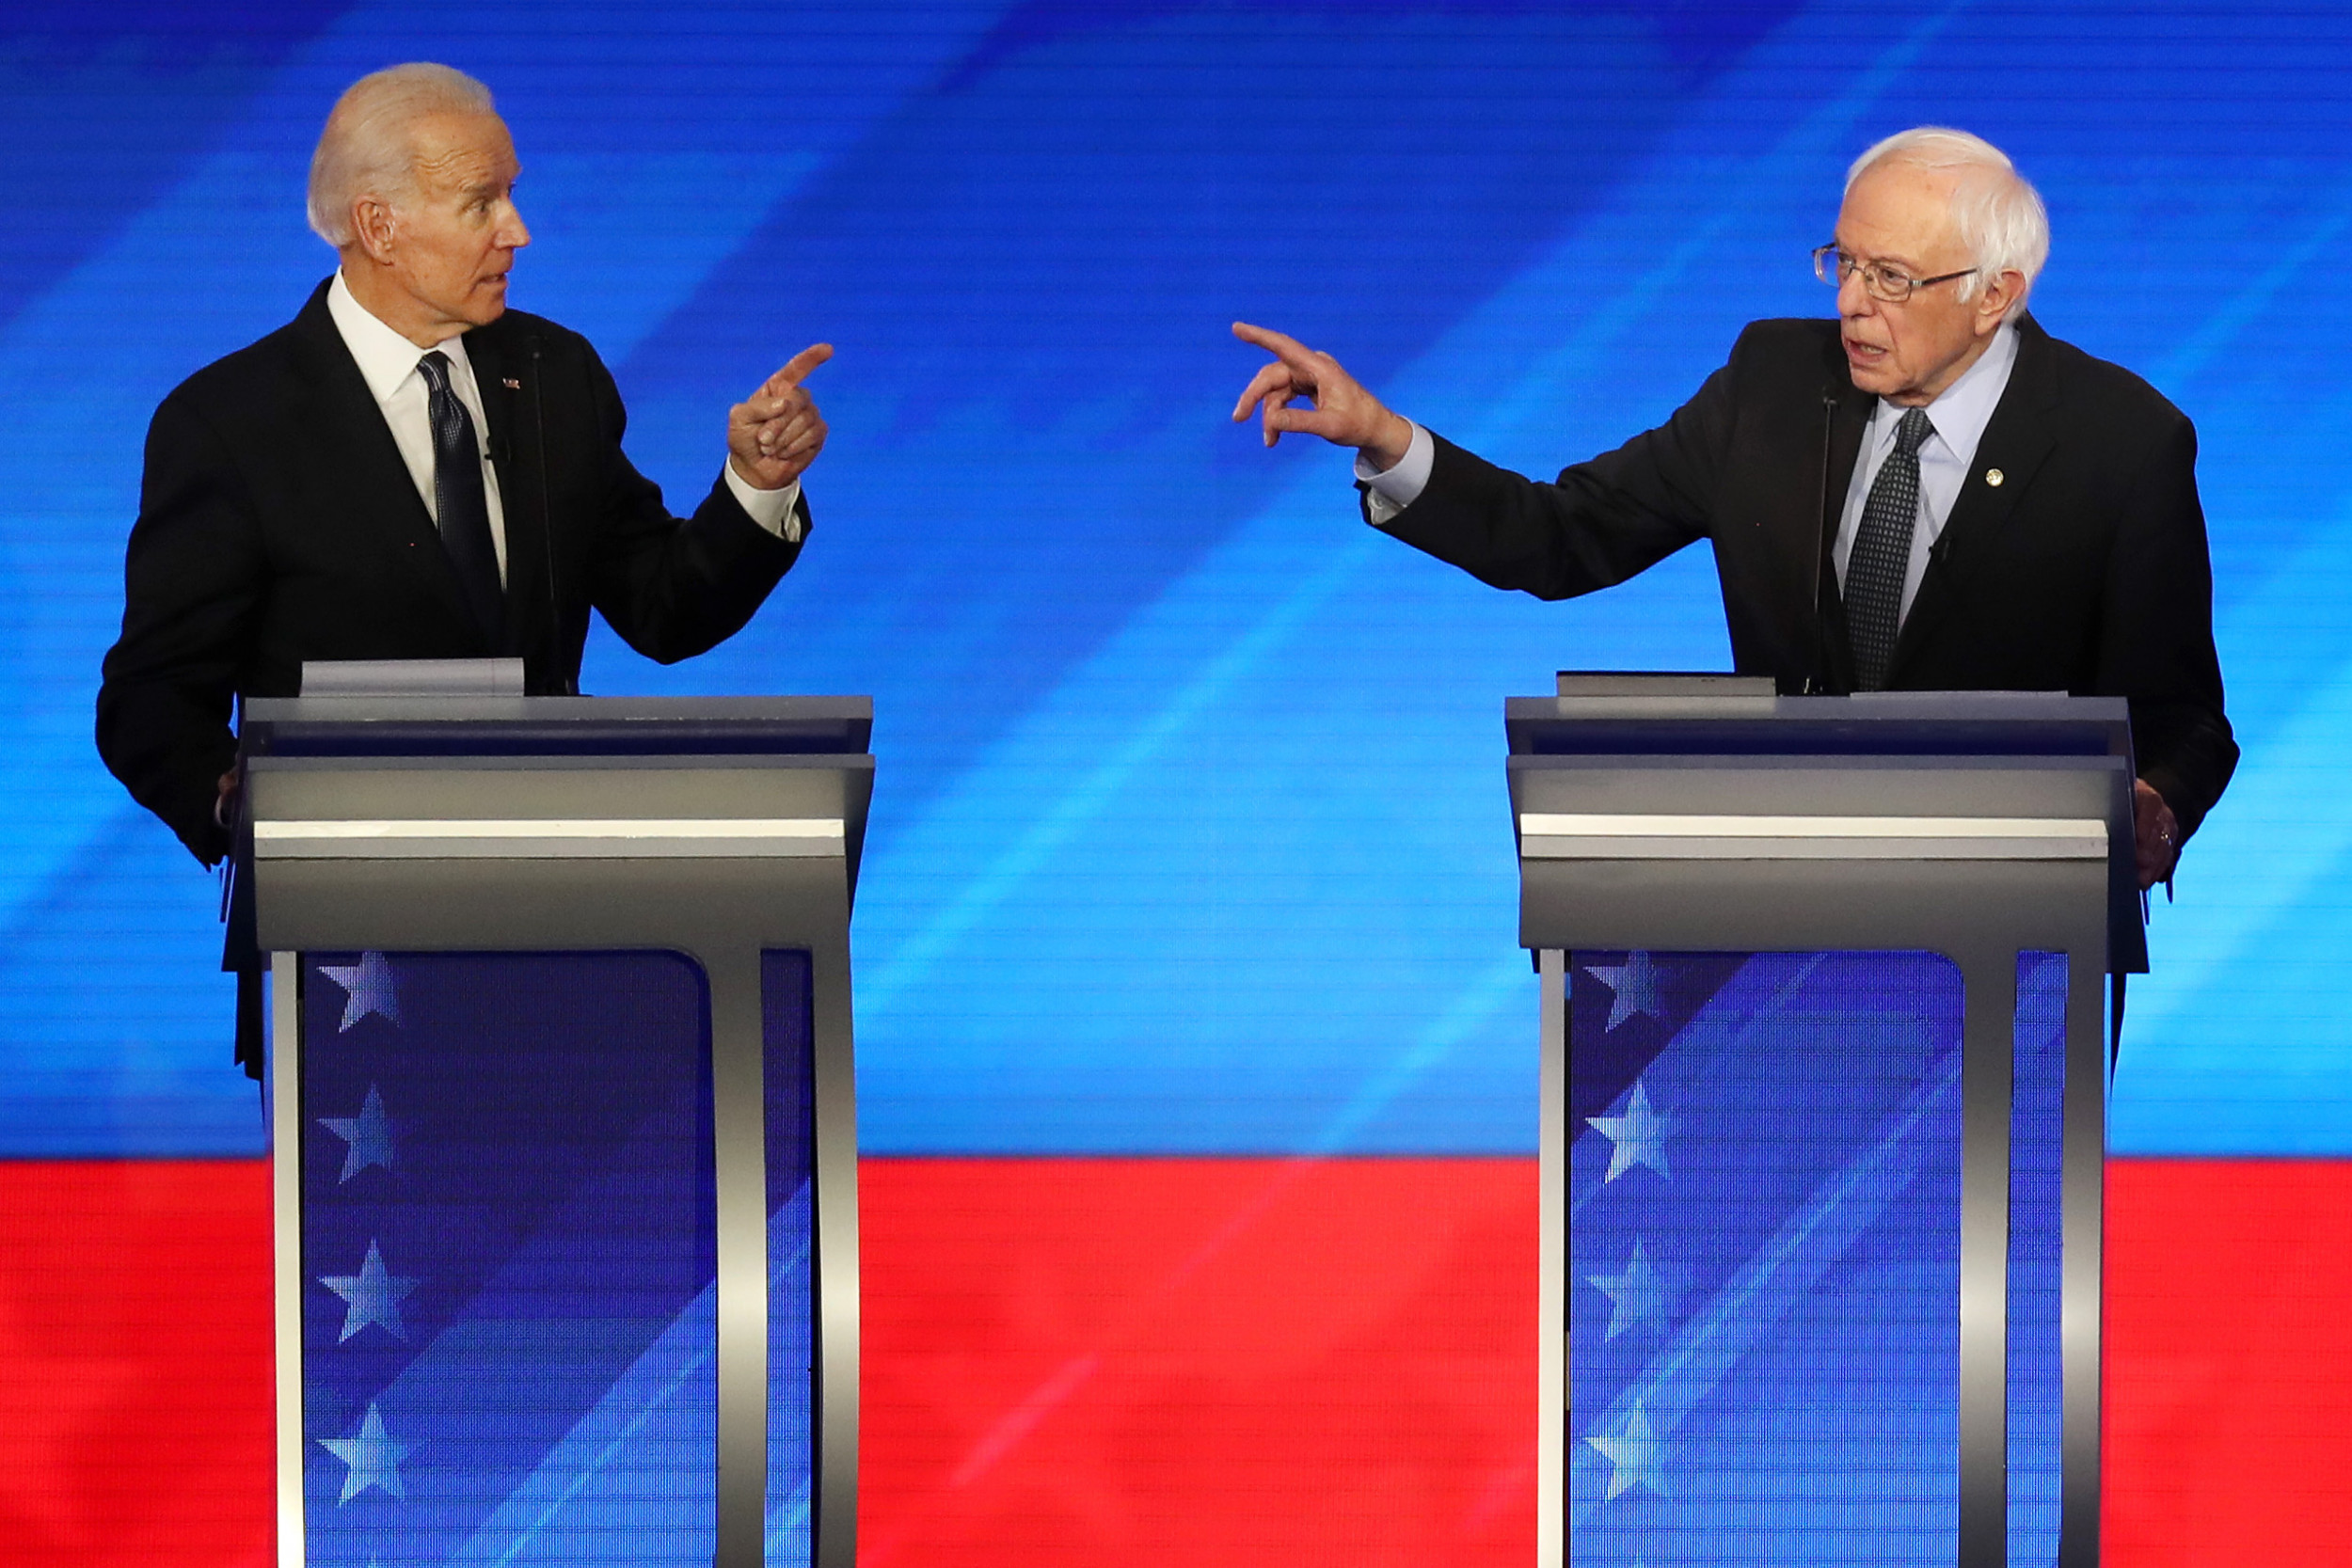 Joe Biden Says He'd Be The 'Most Progressive' President in ...